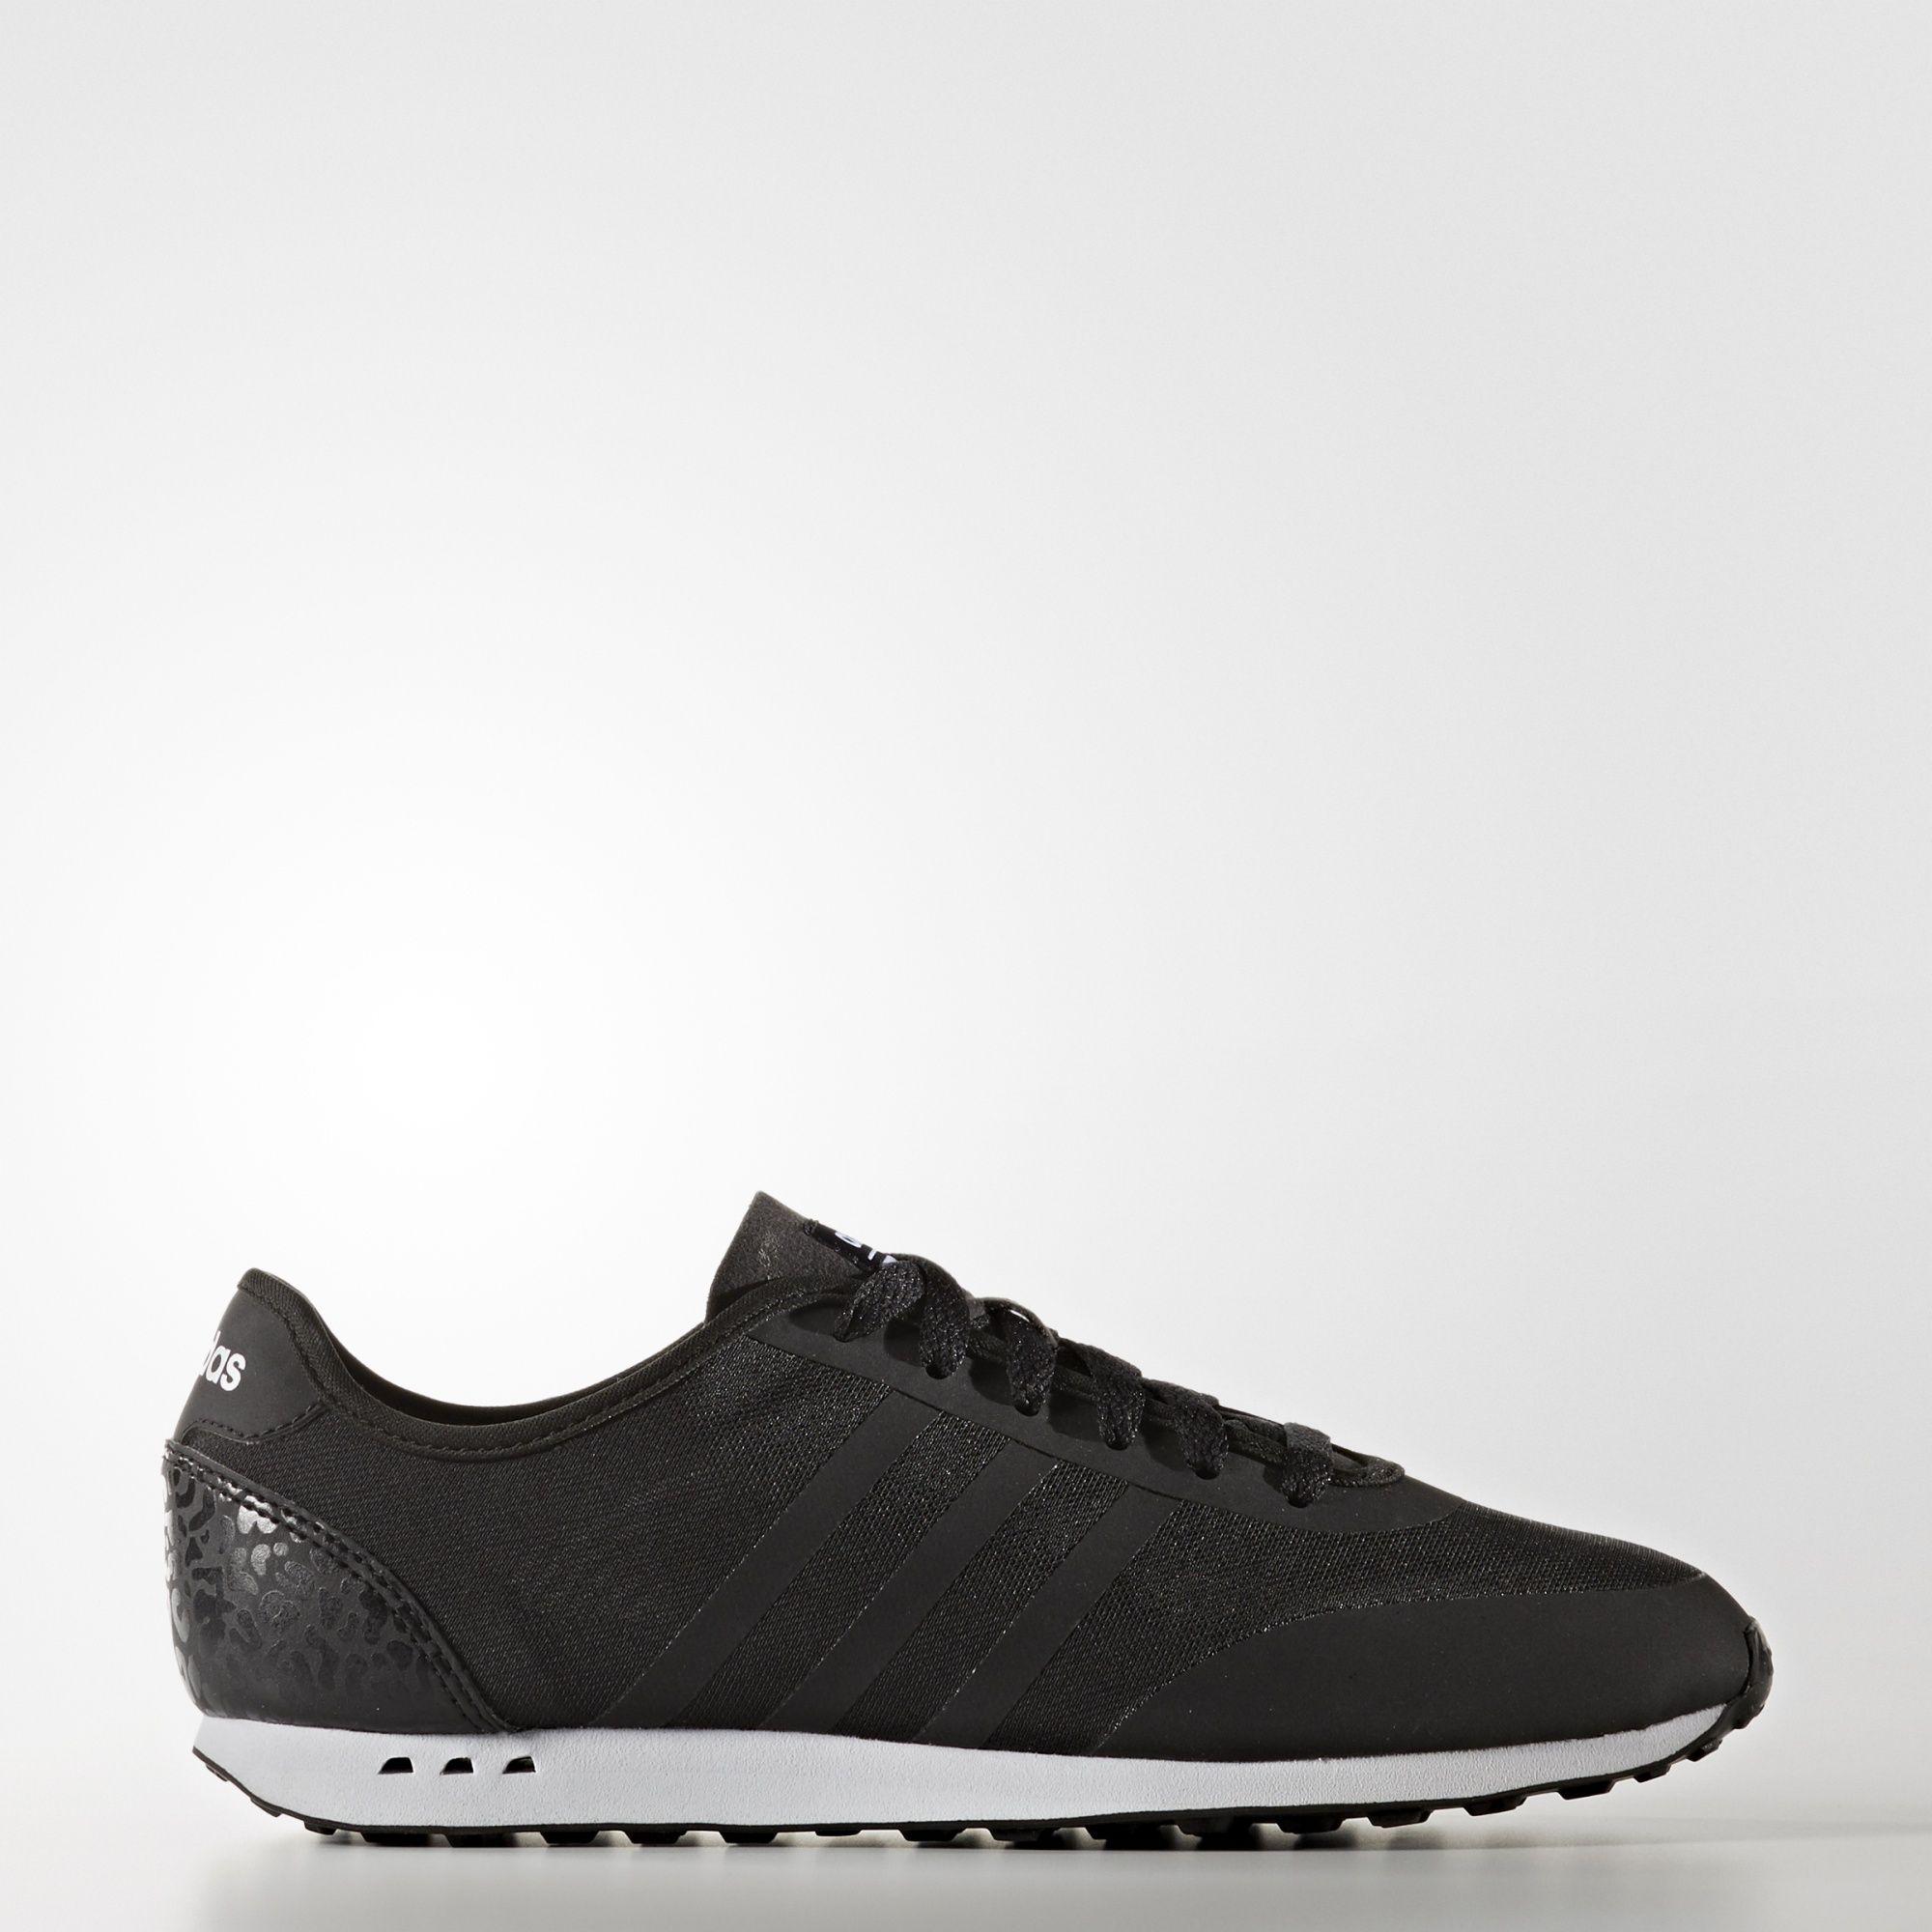 adidas Cloudfoam Groove TM Shoes - Black | adidas US